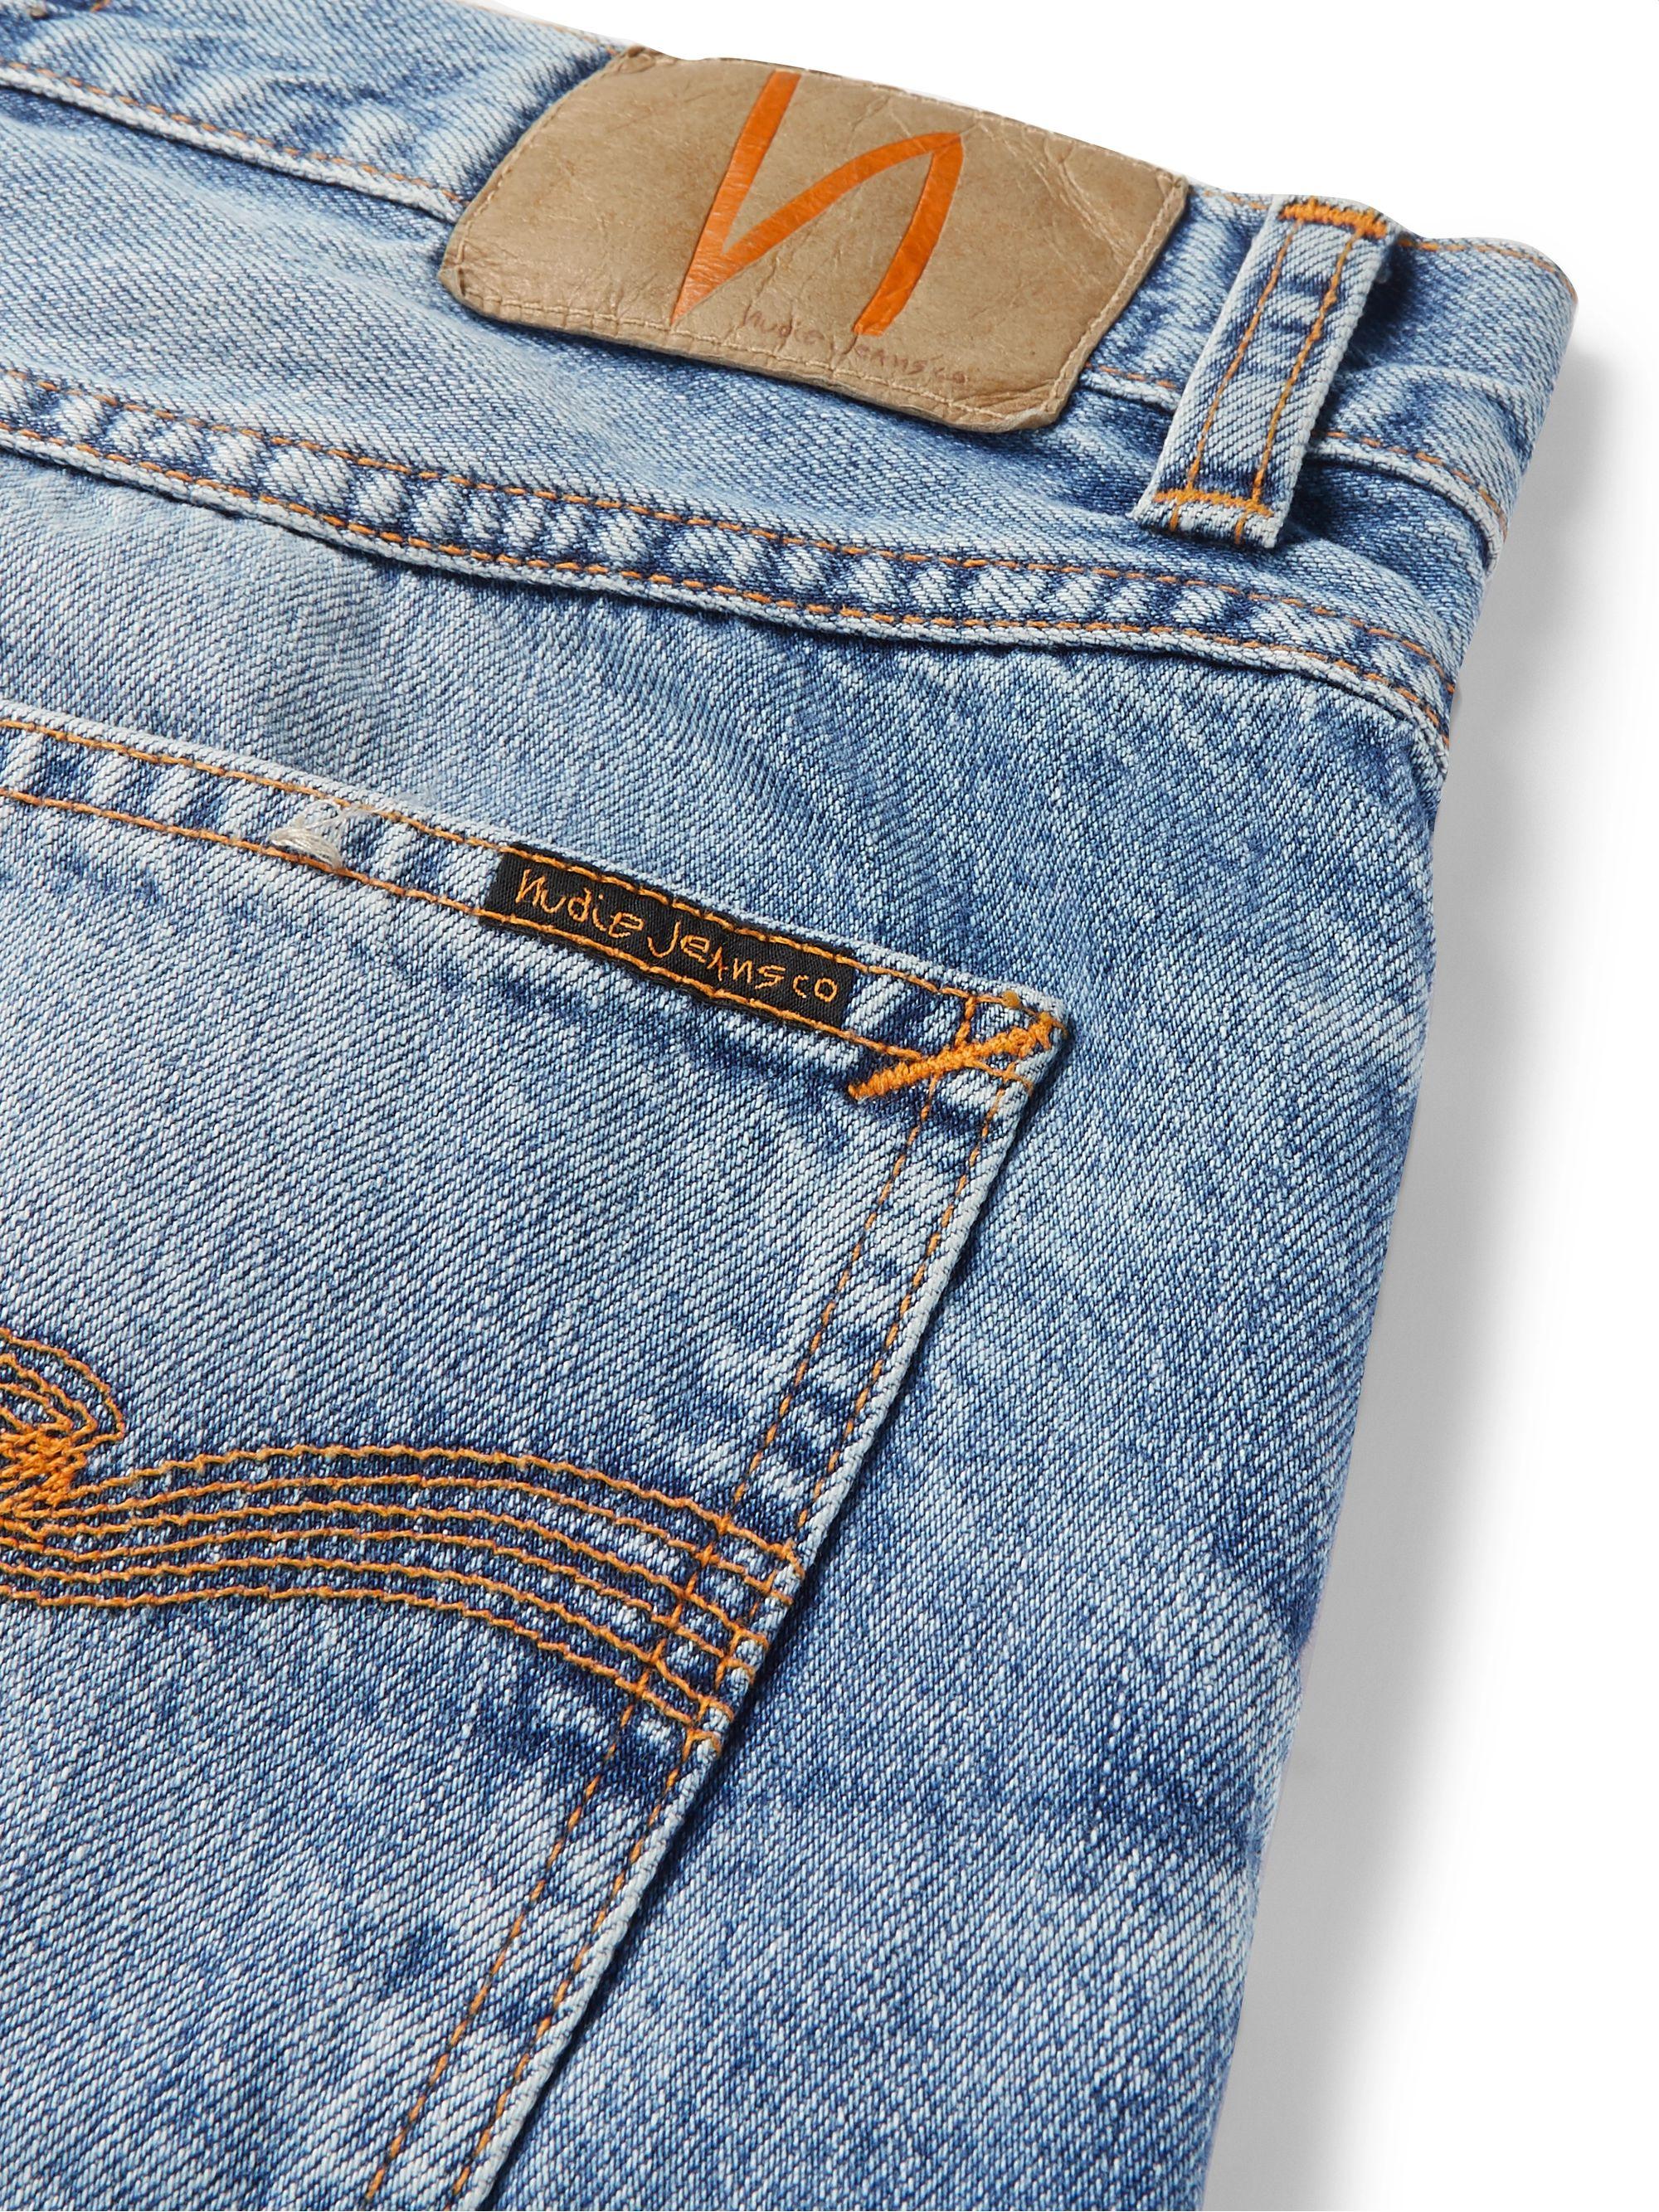 Steady Eddie II Slim Fit Organic Denim Jeans